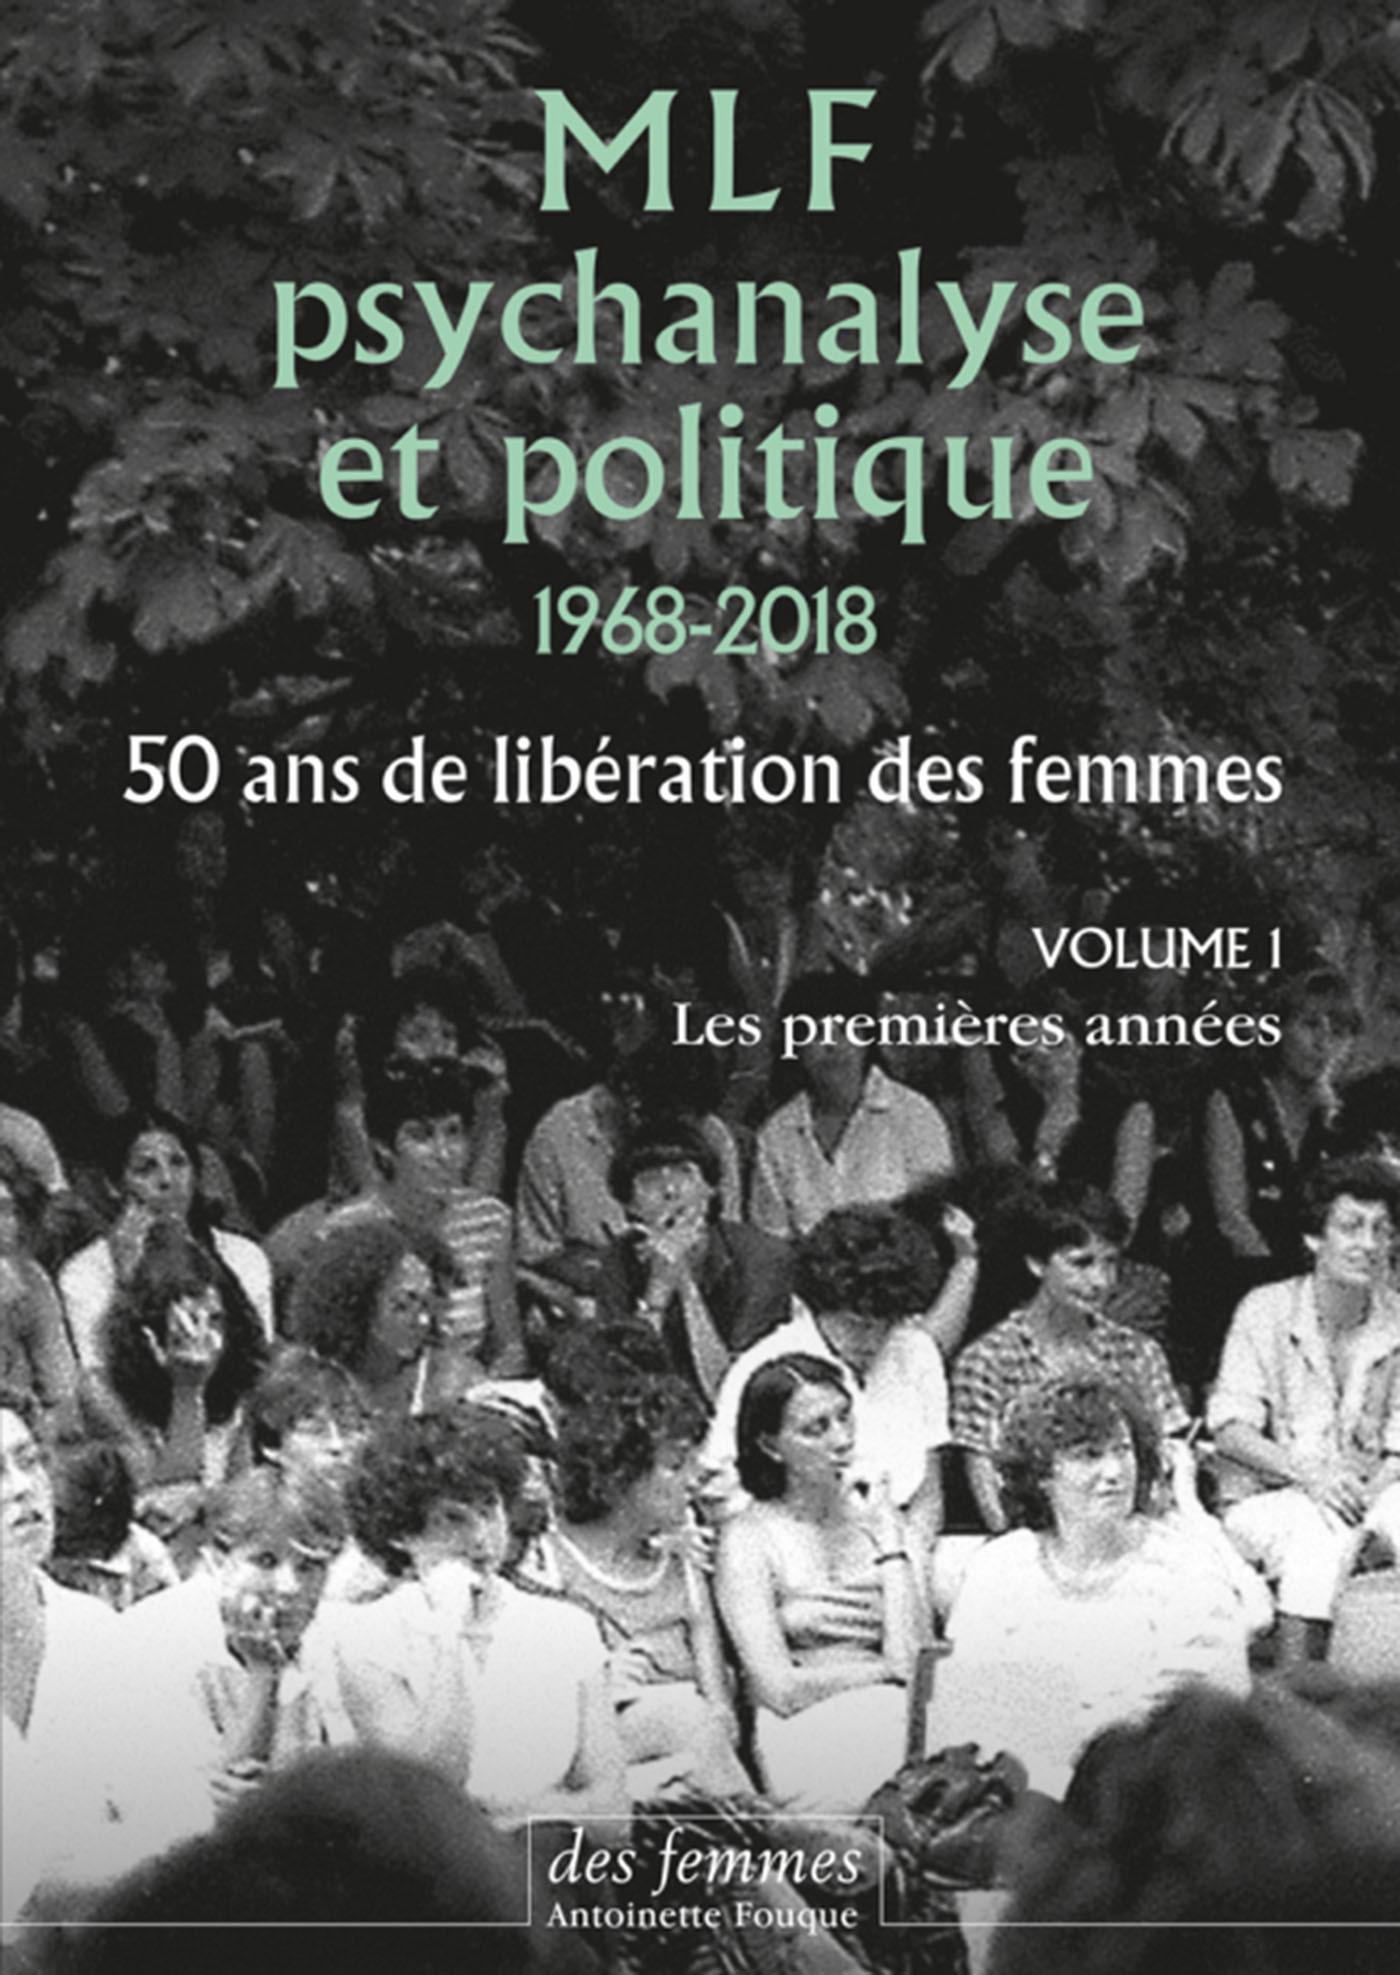 MLF-PSYCHANALYSE ET POLITIQUE VOLUME 1